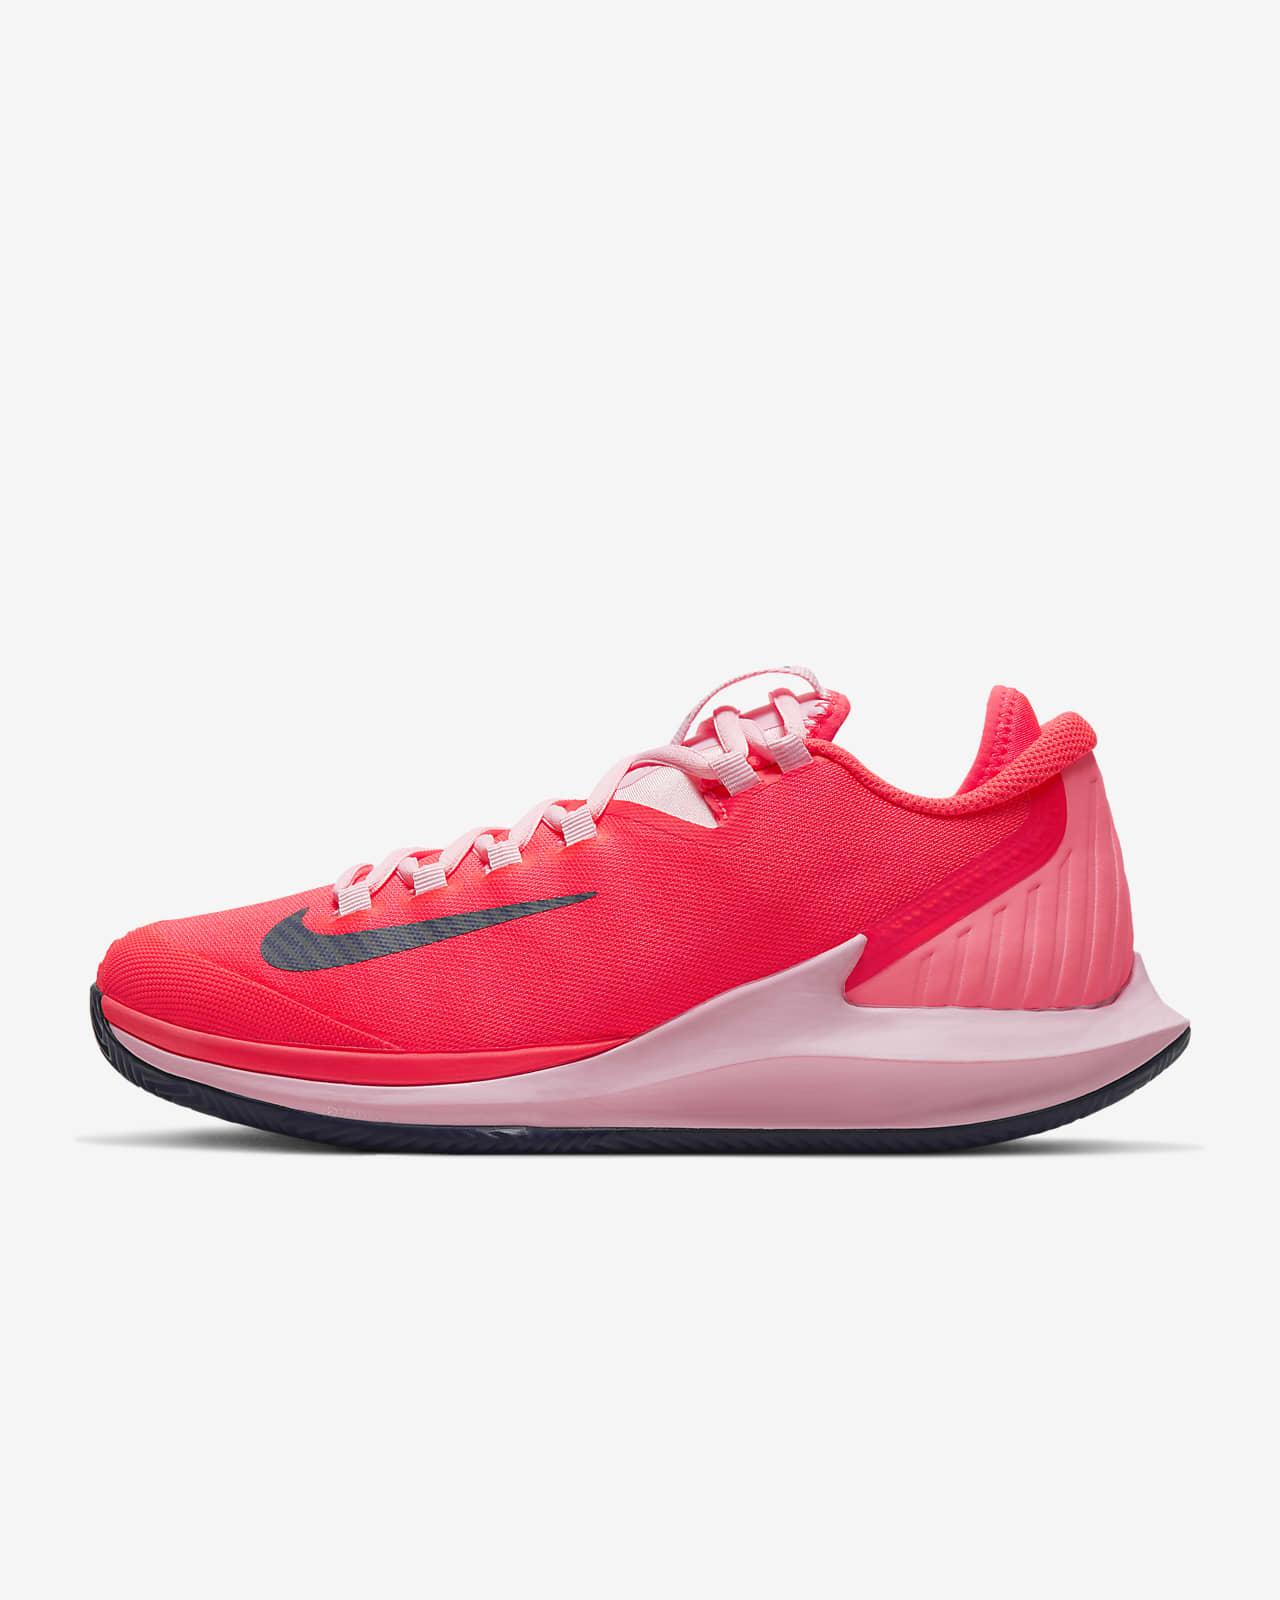 NikeCourt Air Zoom Zero Women's Clay